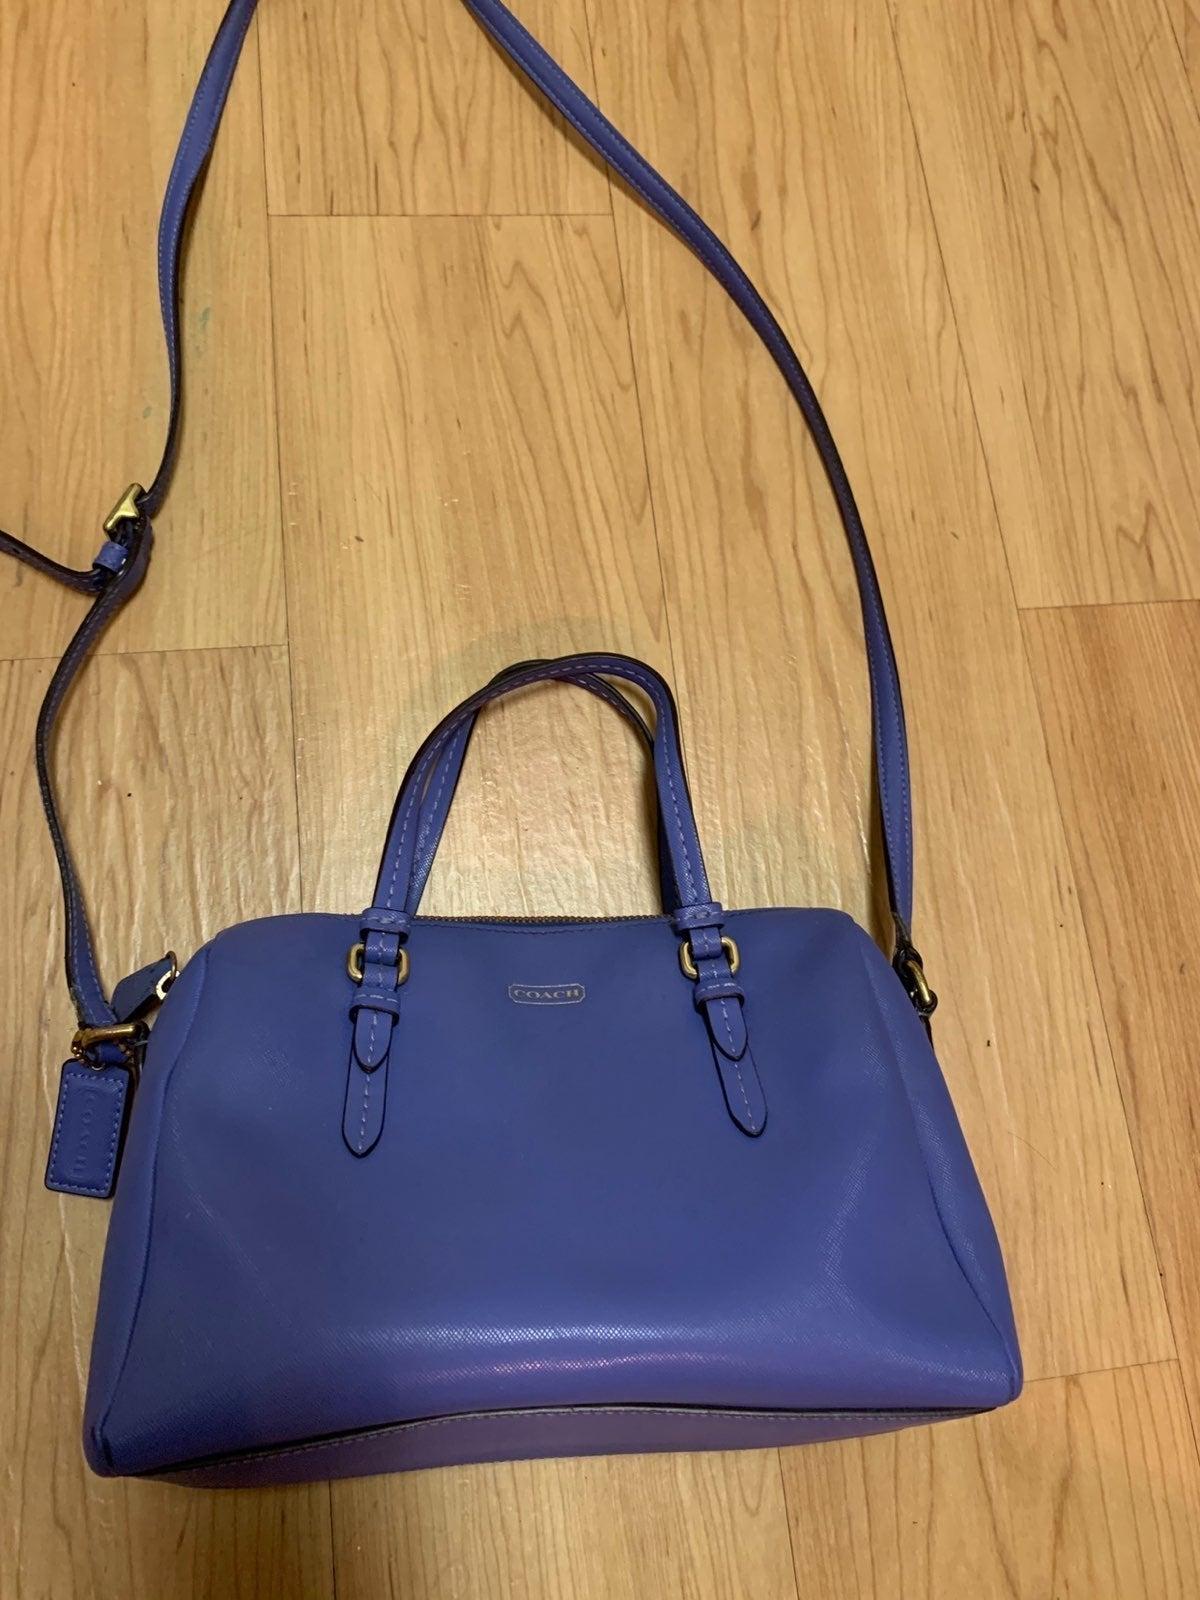 Coach mini satchel crossbody blue handba